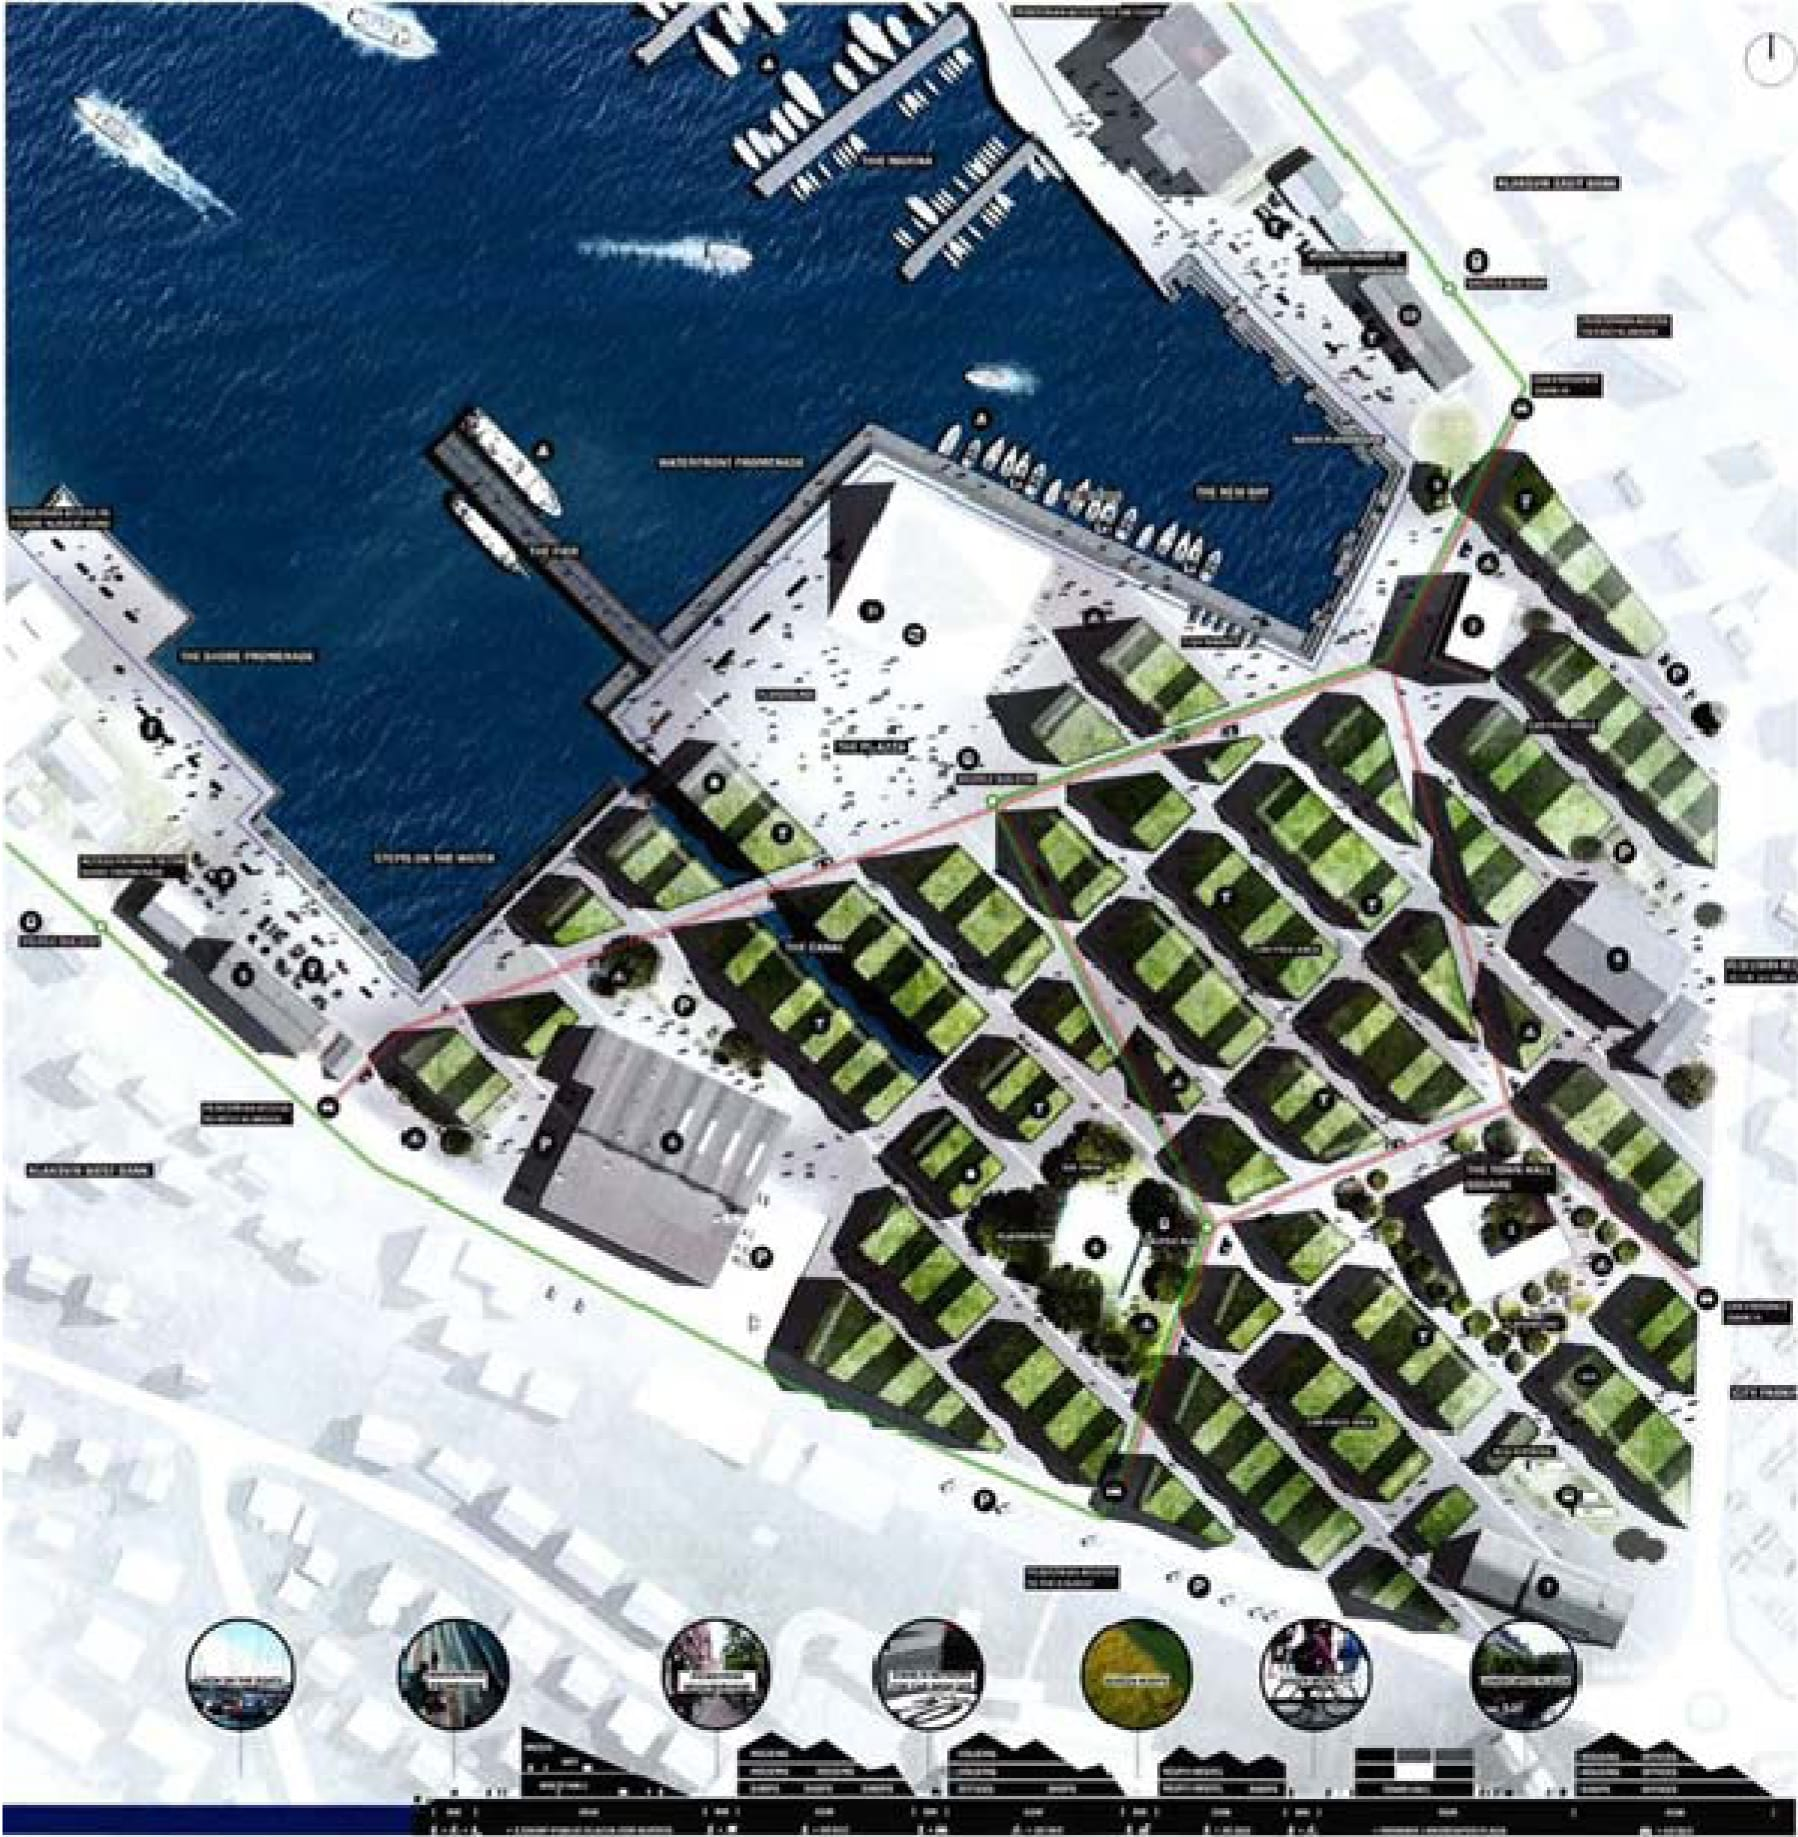 20120601-klaksvik-jury report-9